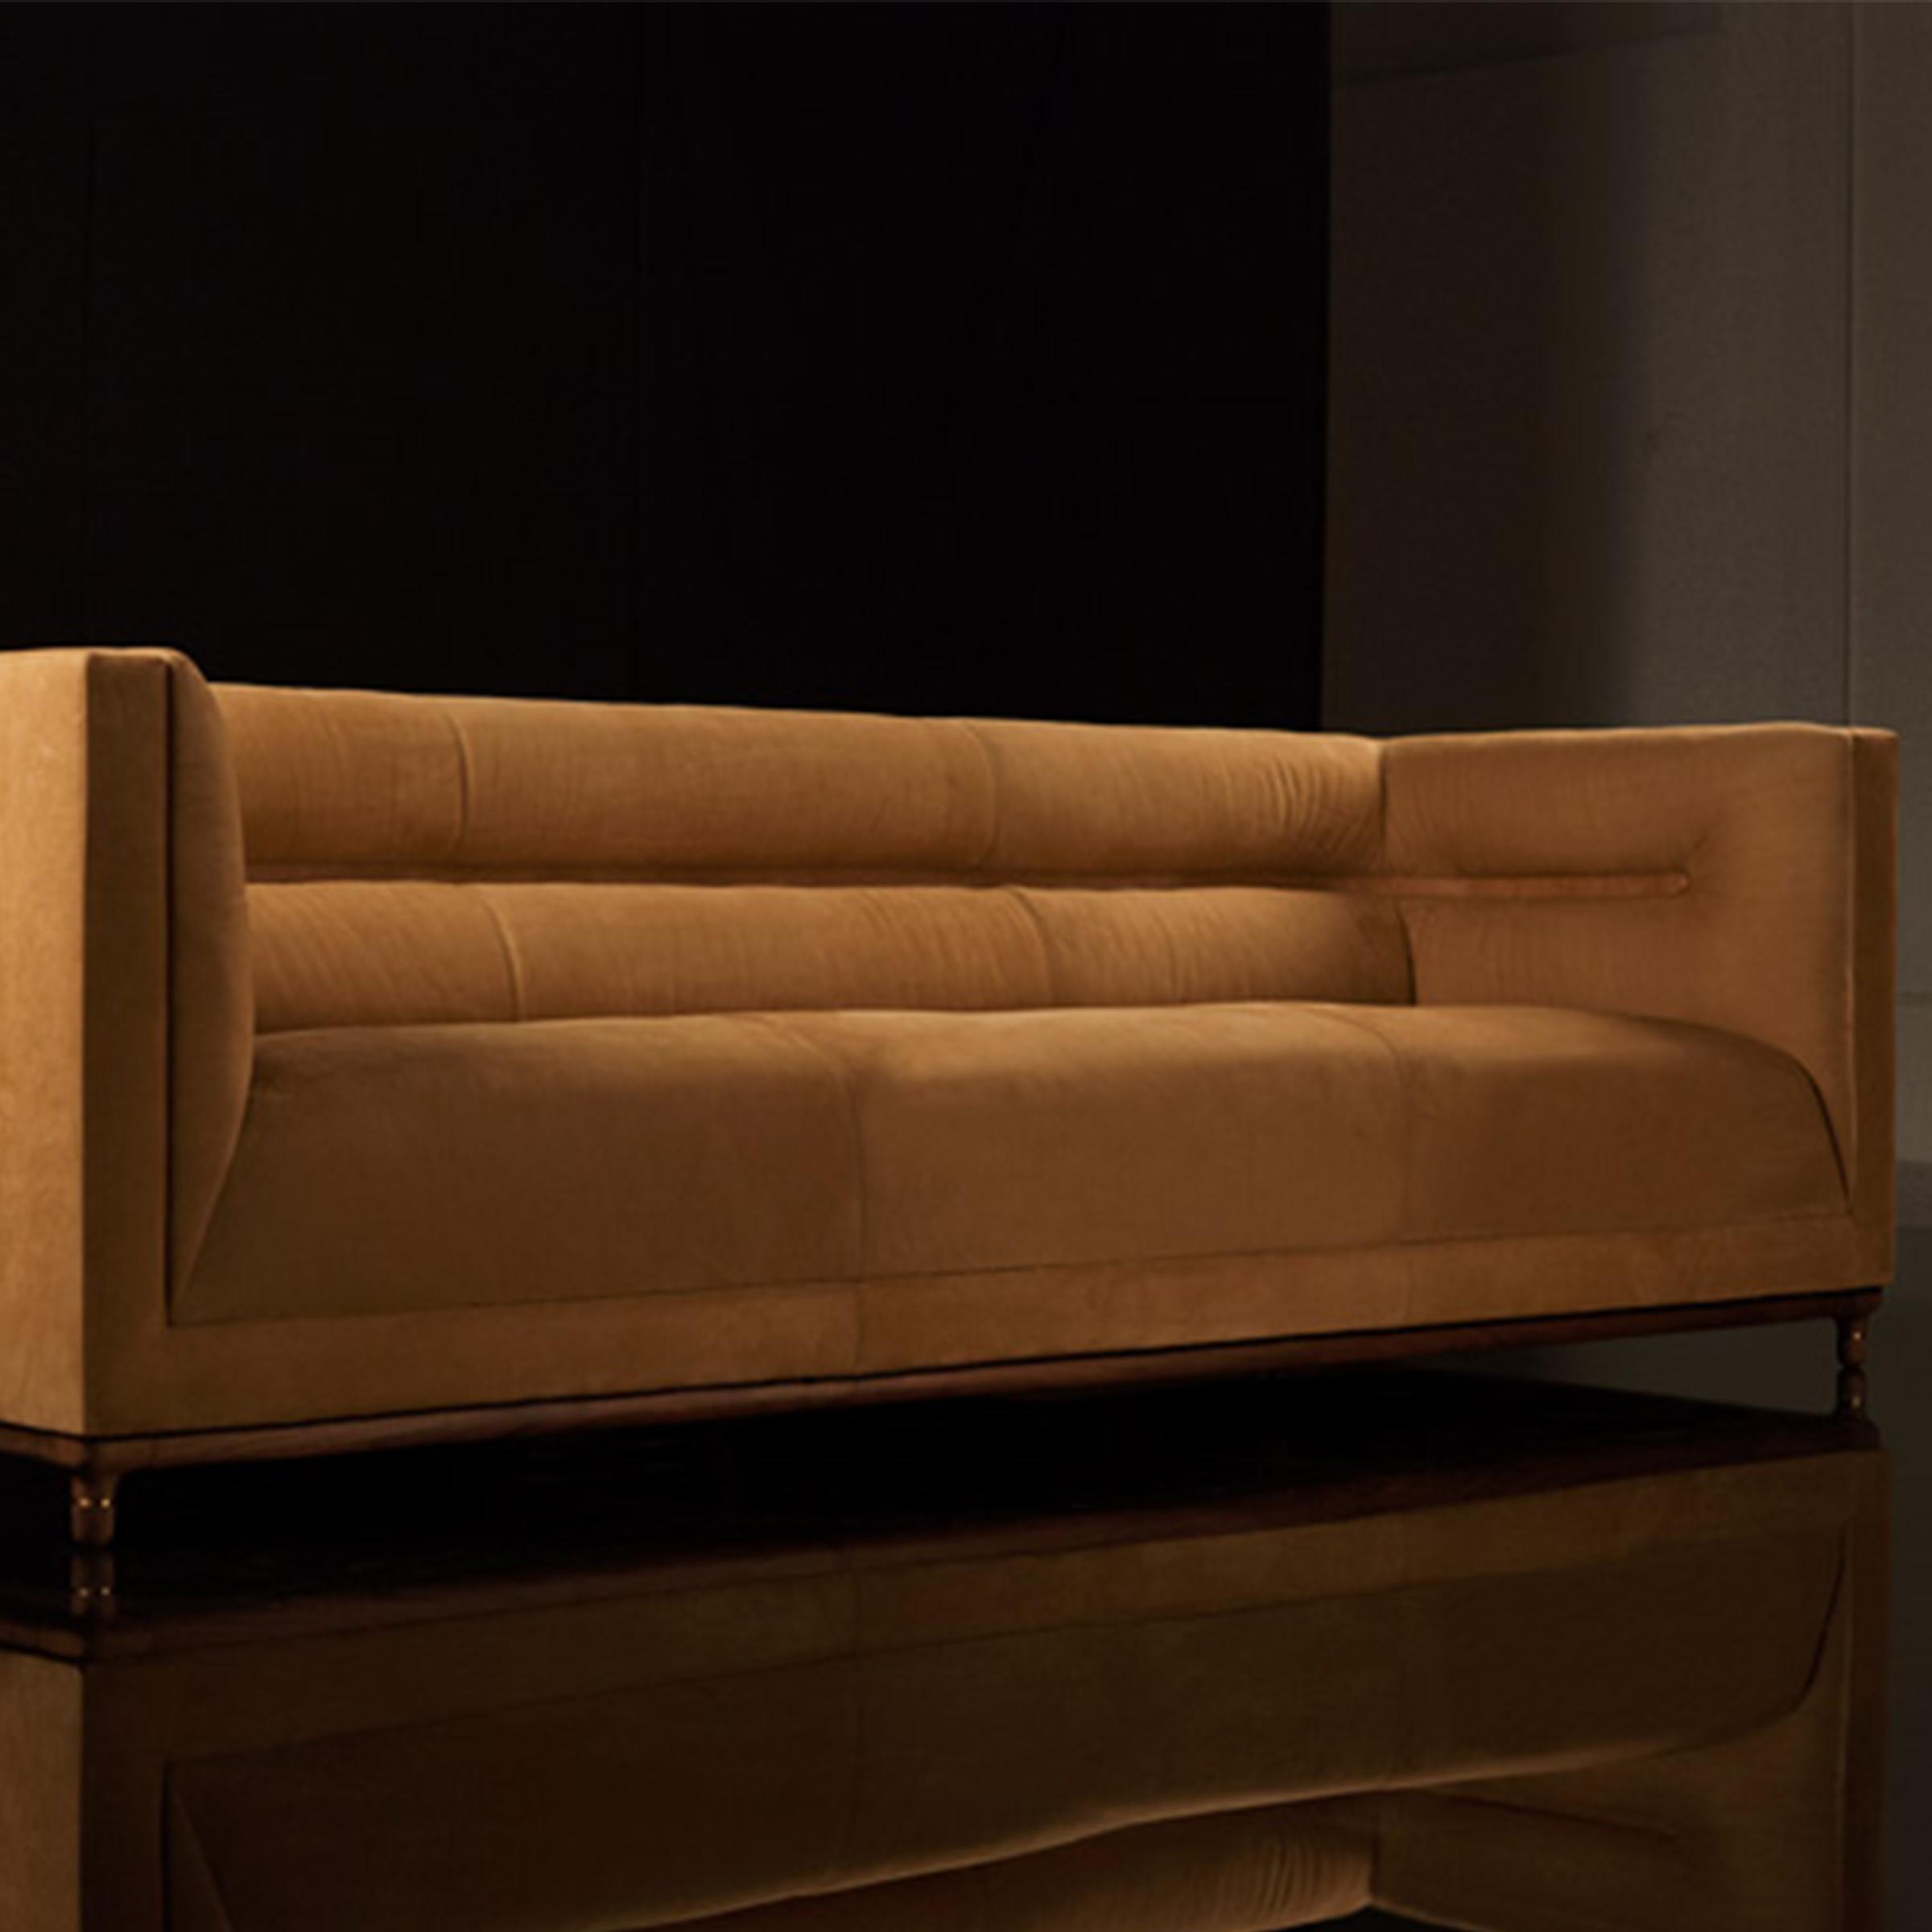 Designapplause Alex Jephson Robb For Bernhardt Design